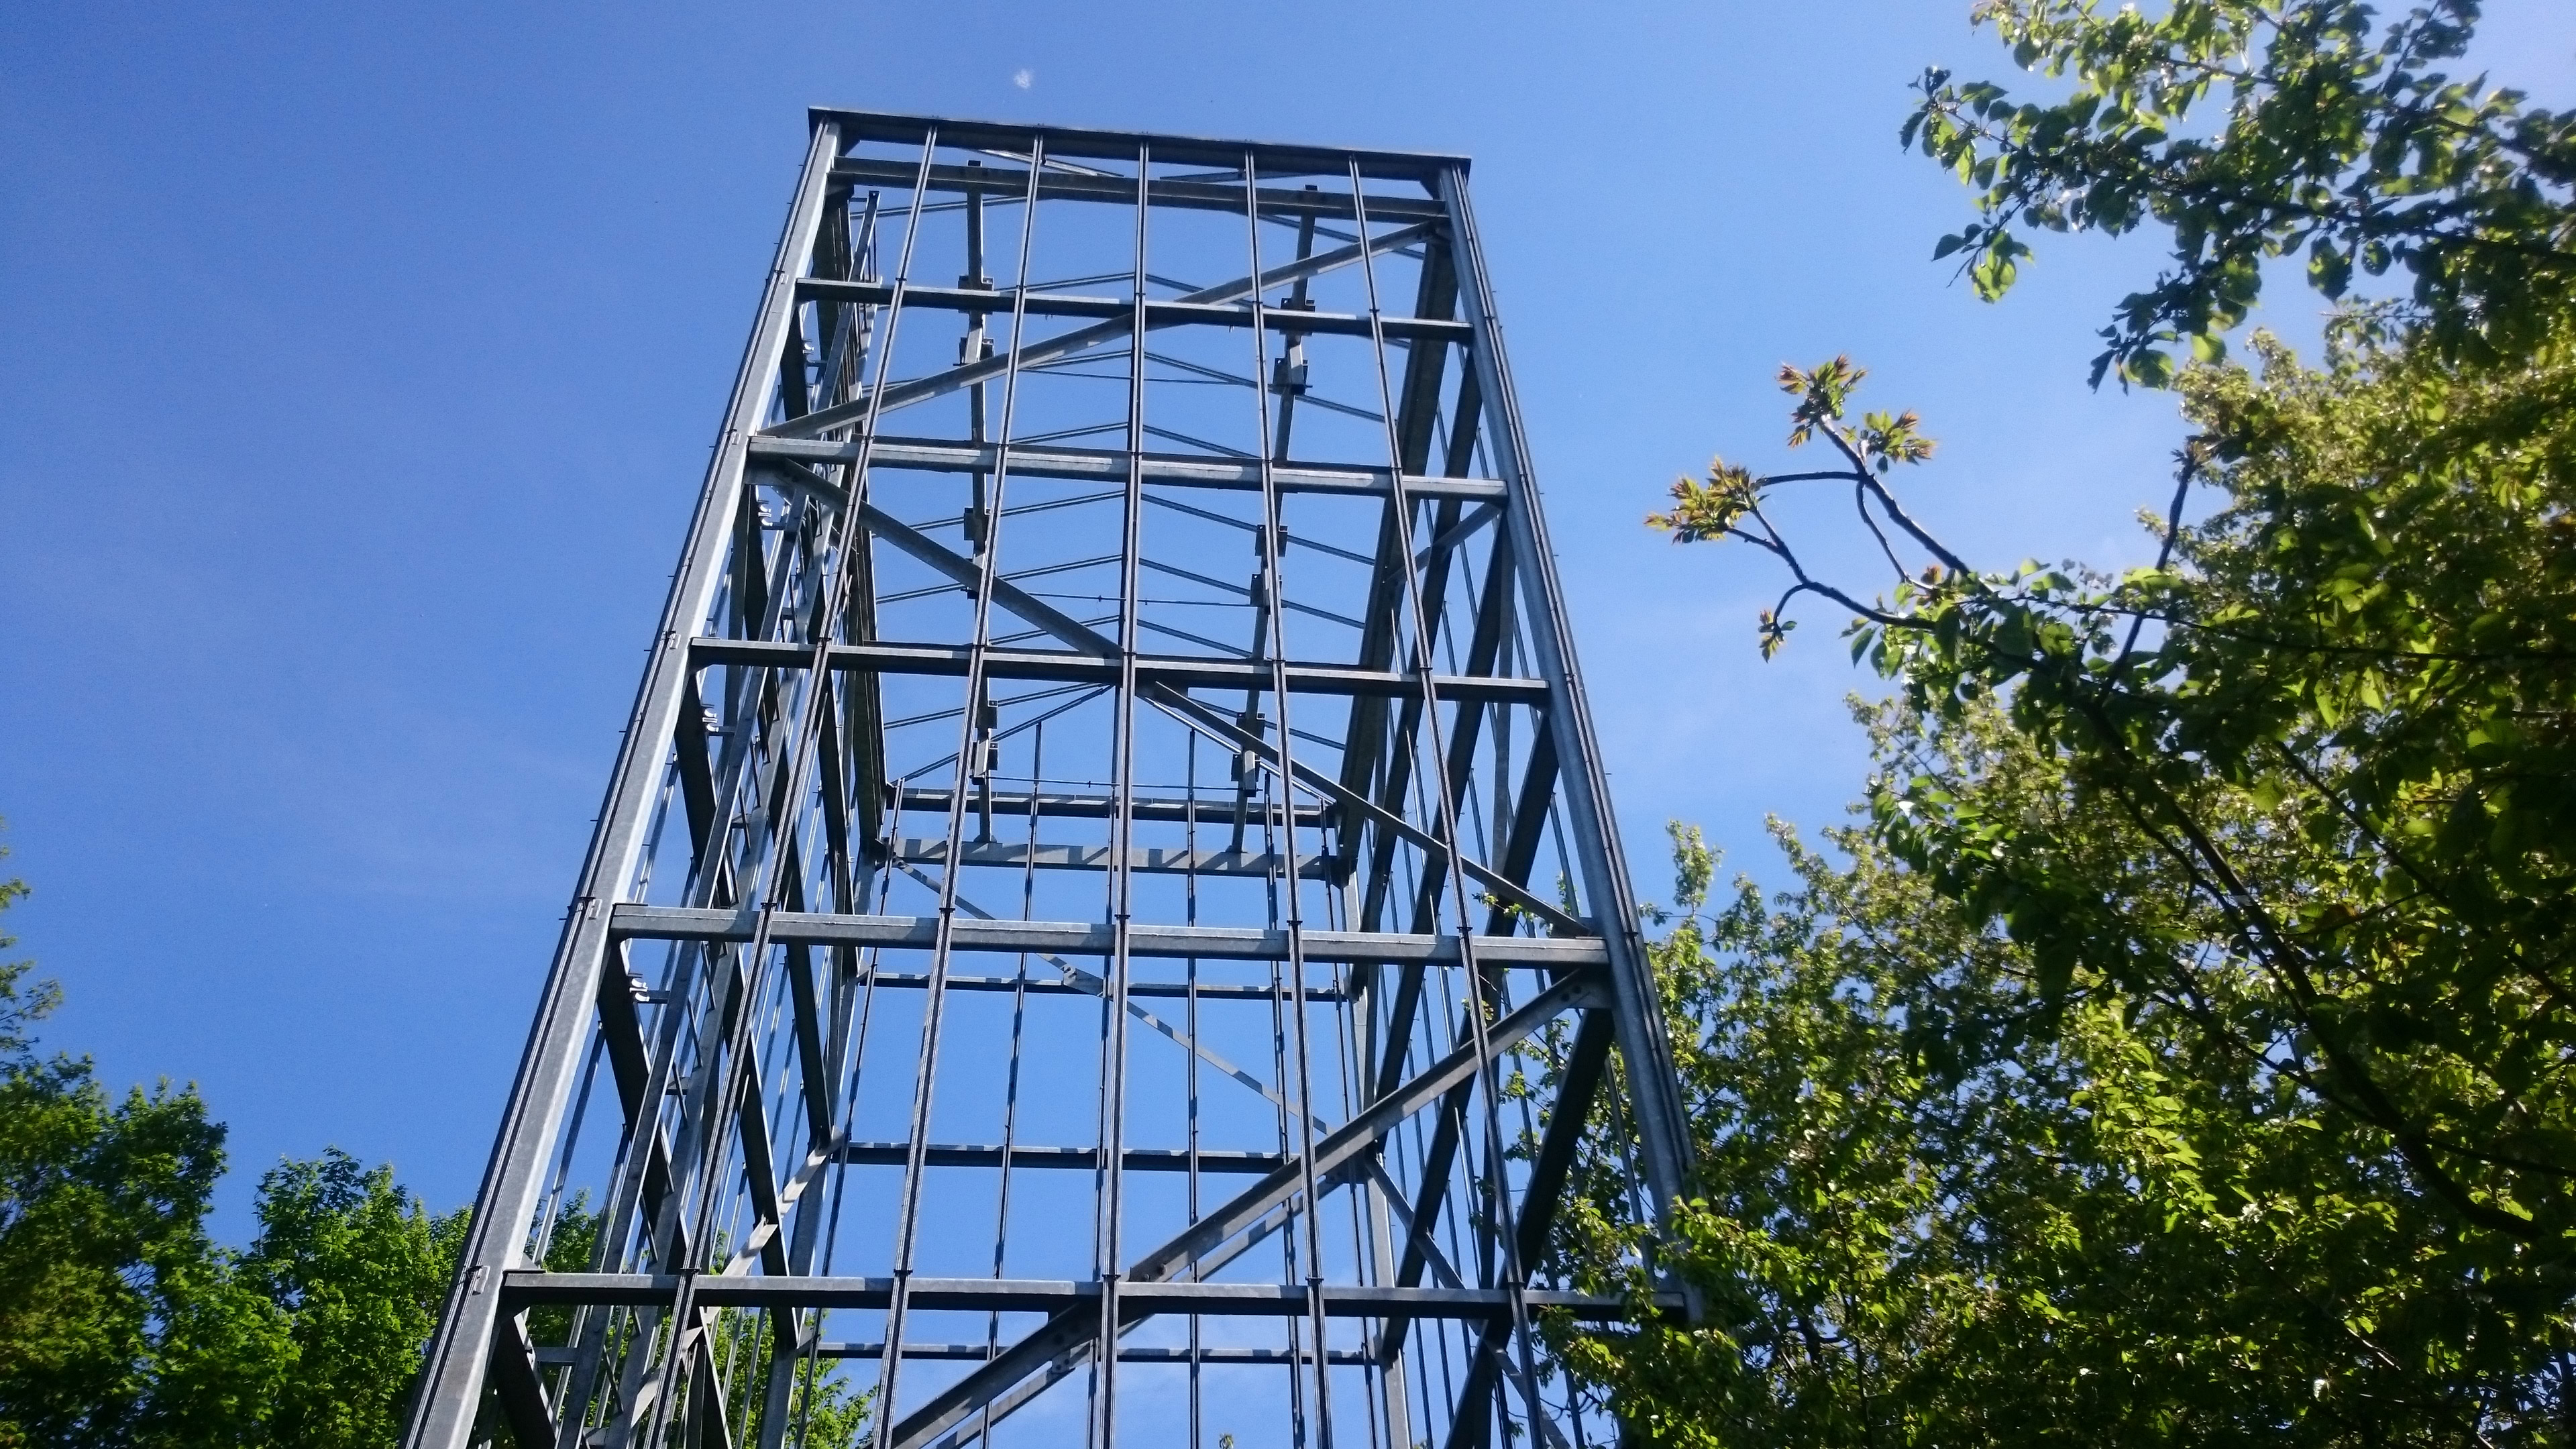 Pressphoto: Ruthner tower 1964, Kurpark Oberlaa (Copyright 2016: vertical farm institute)